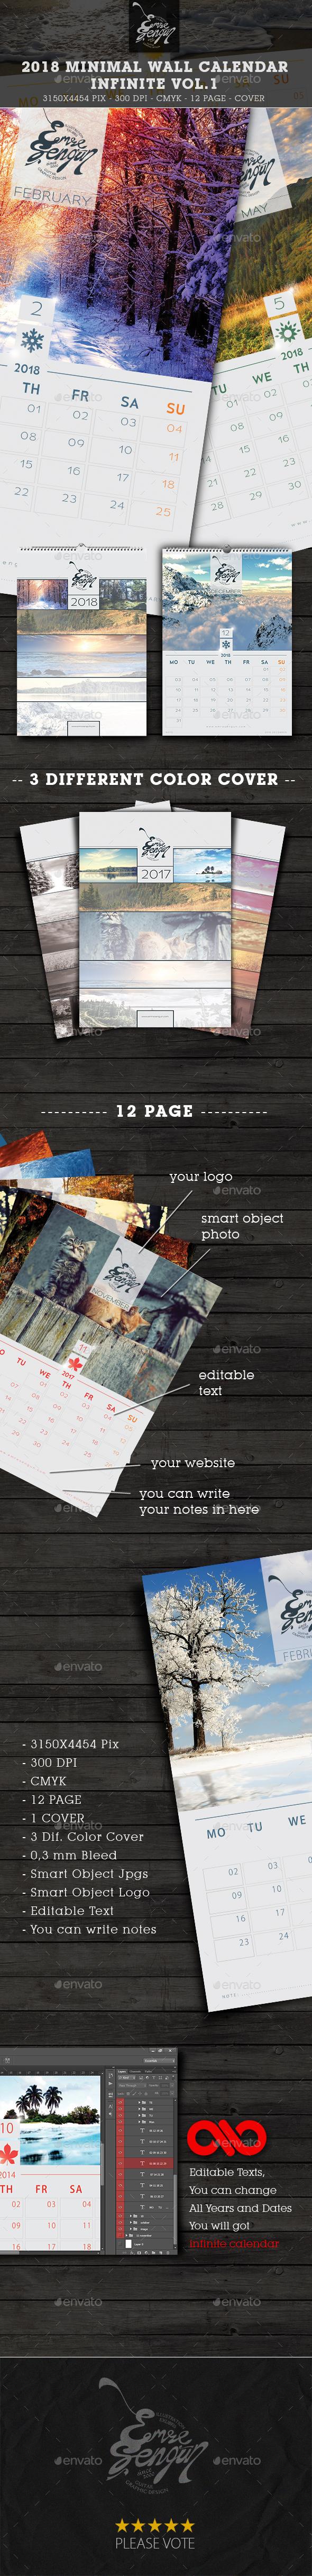 2018 - 2017 Calendar Minimal Wall Infinite Vol.1 - Calendars Stationery